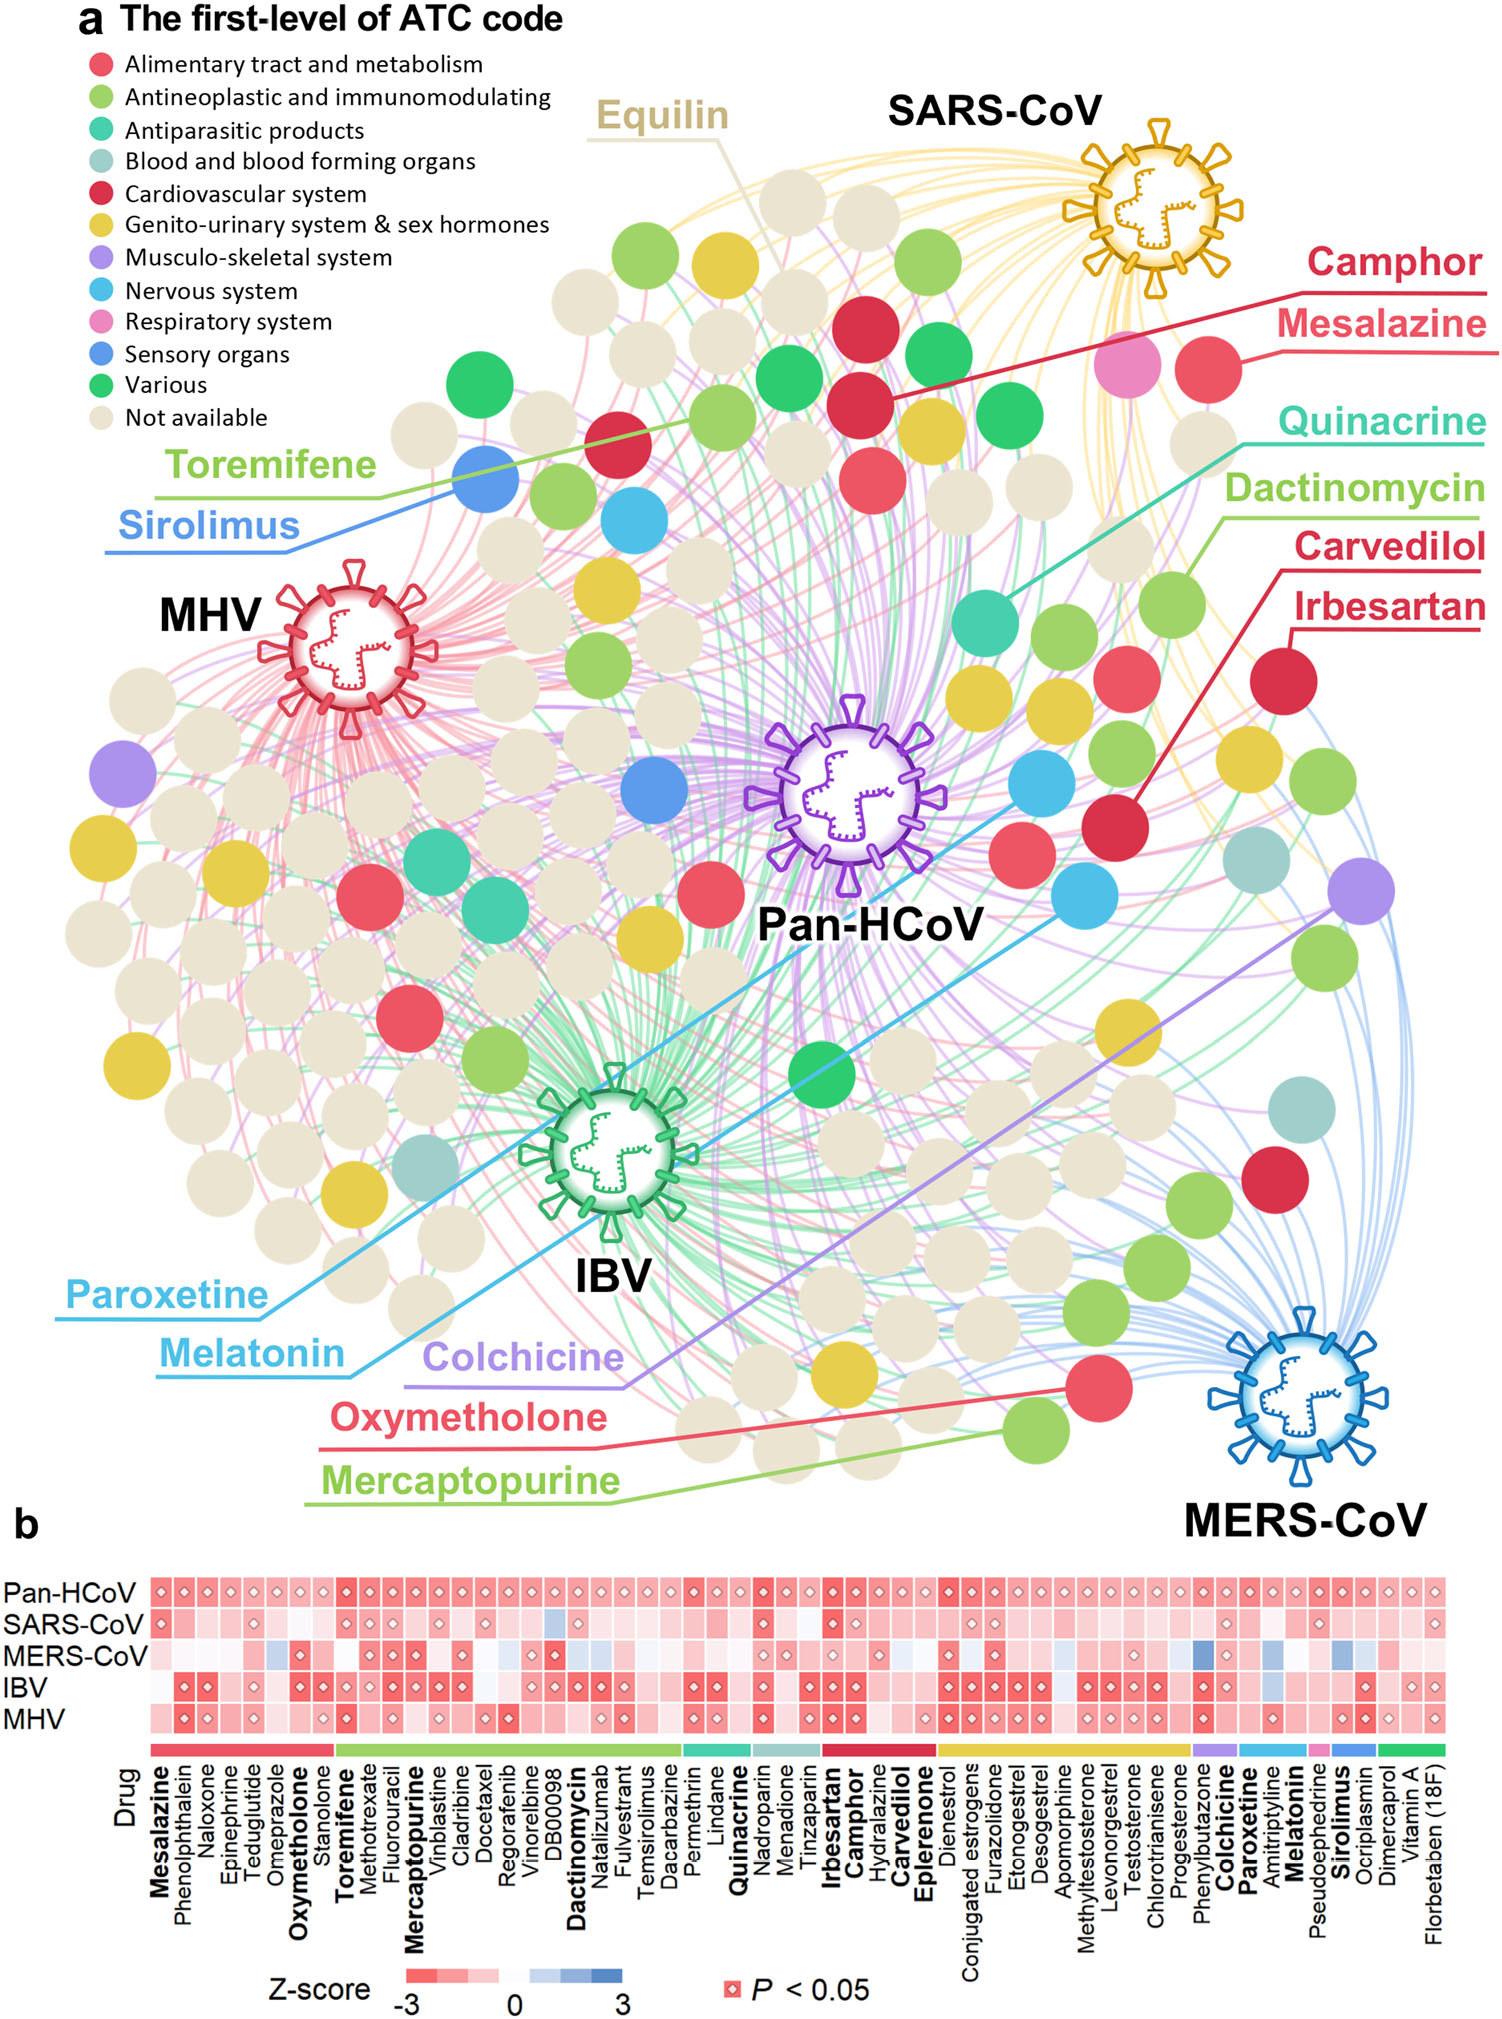 Drug-HCoV network